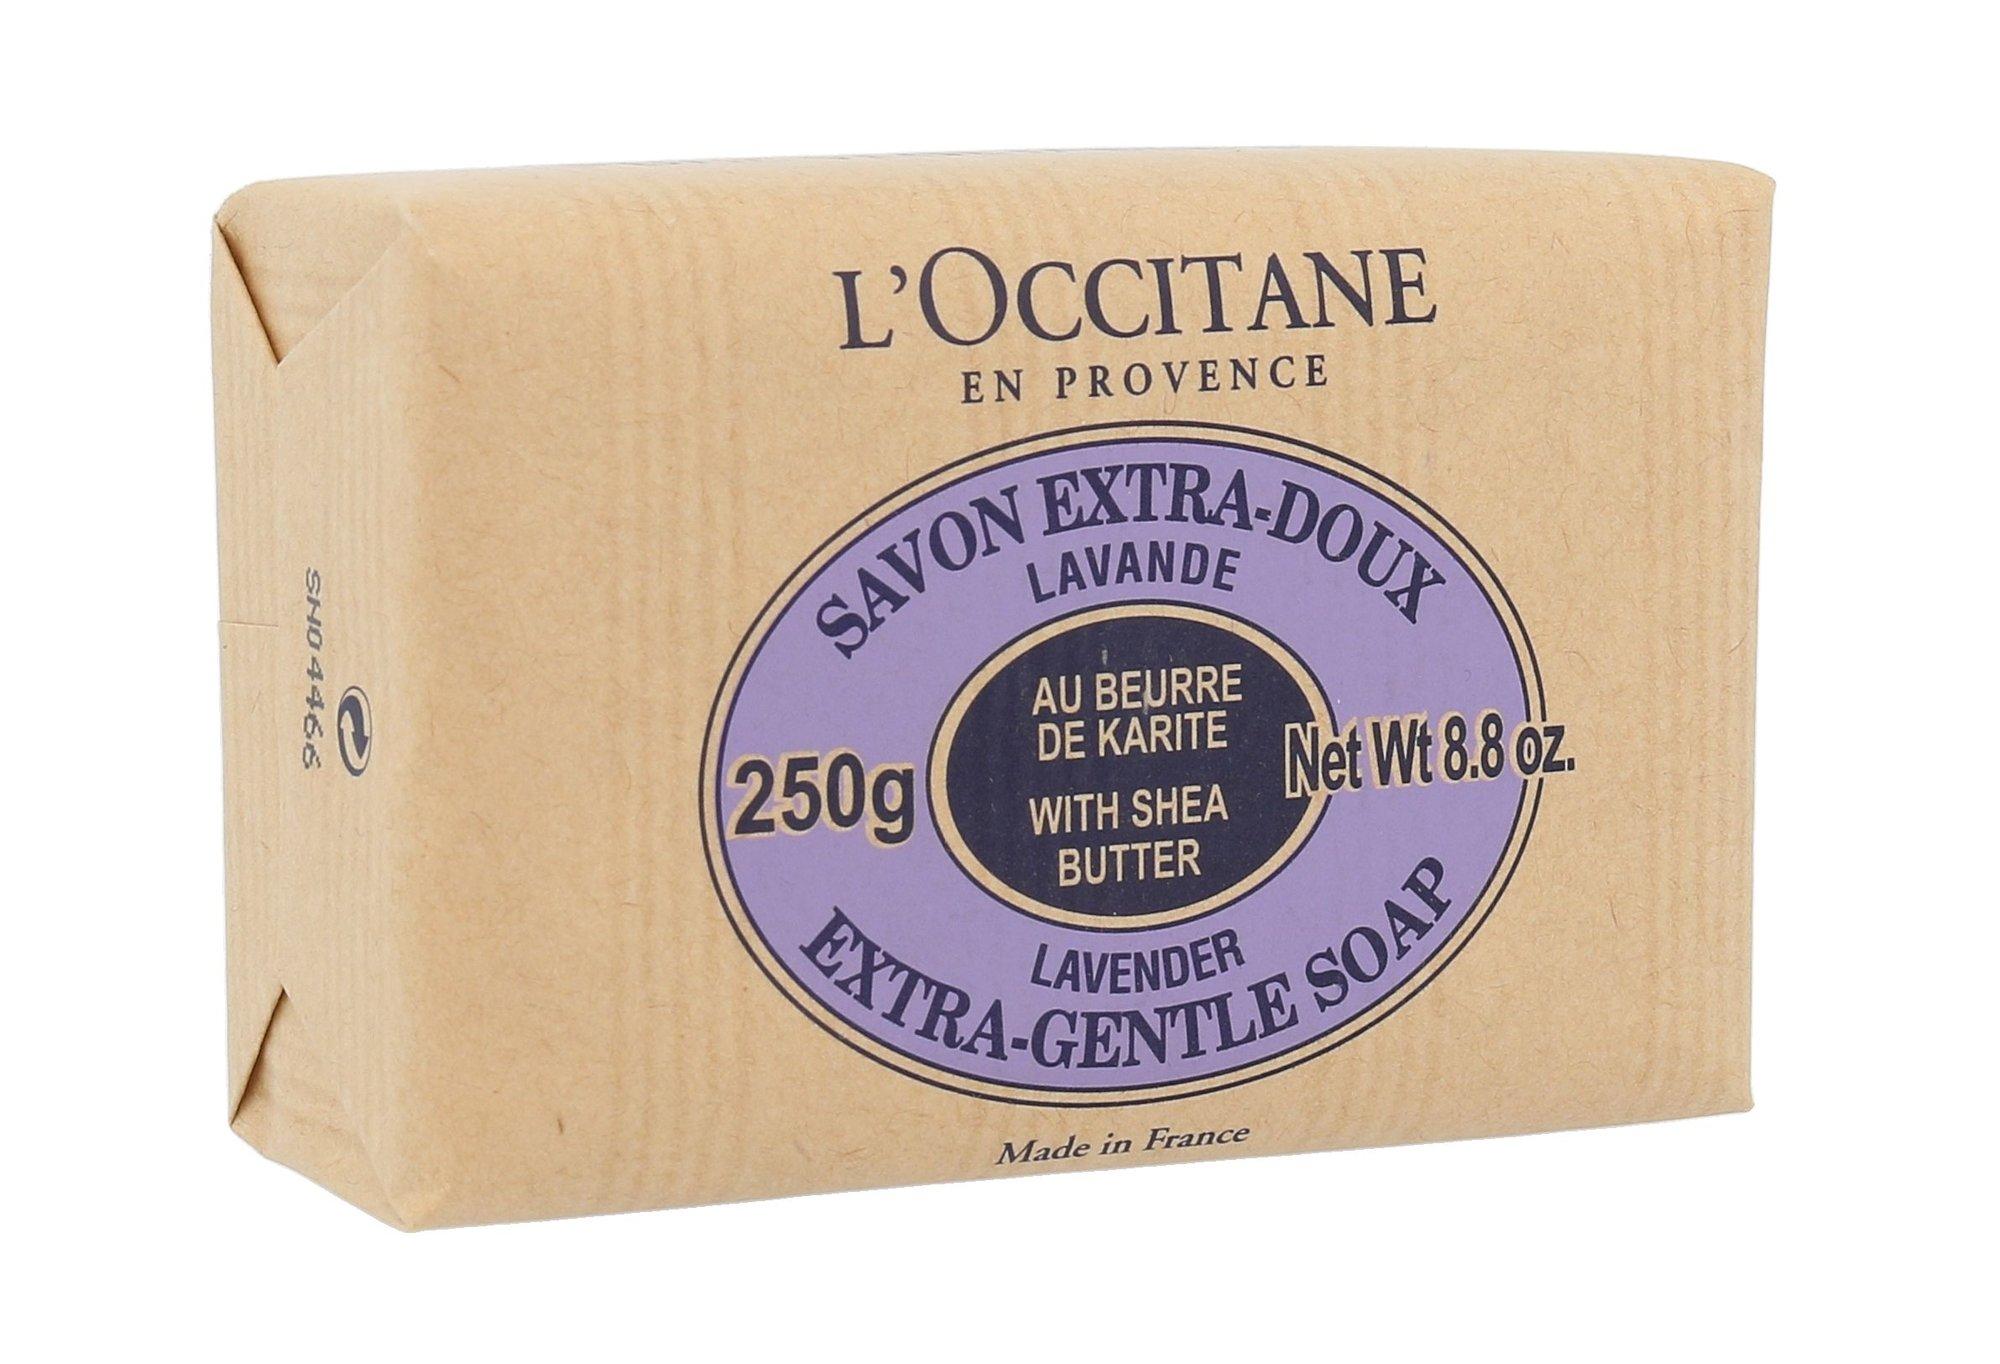 L´Occitane Lavande Extra-Gentle Soap Cosmetic 250g